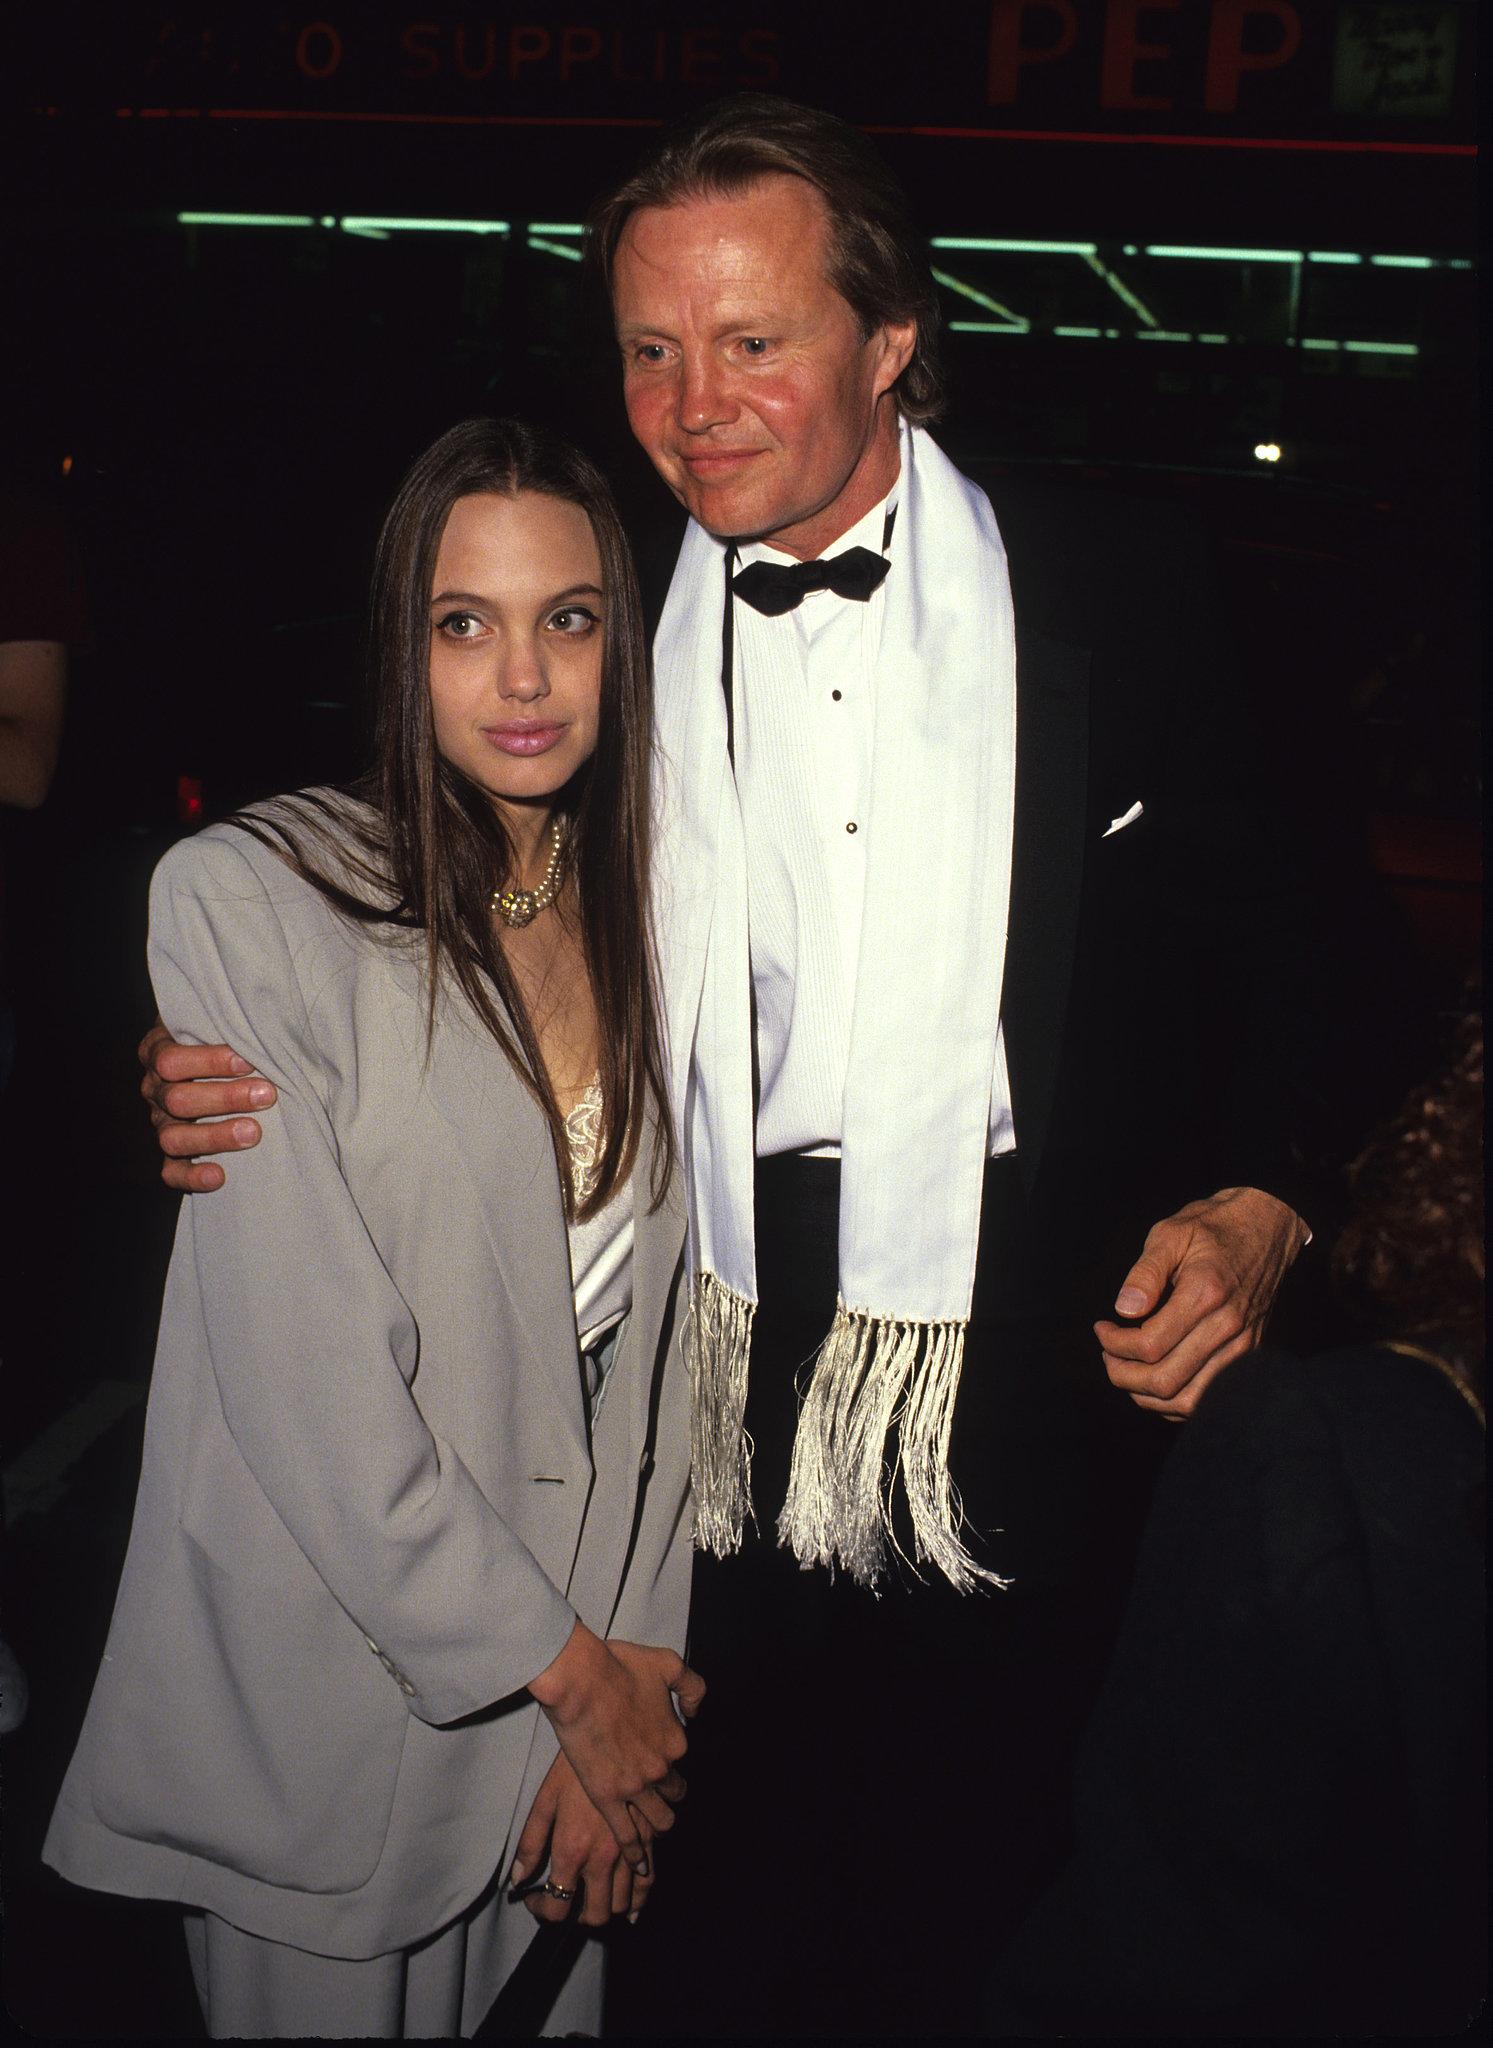 Angelina Jolie, 1990